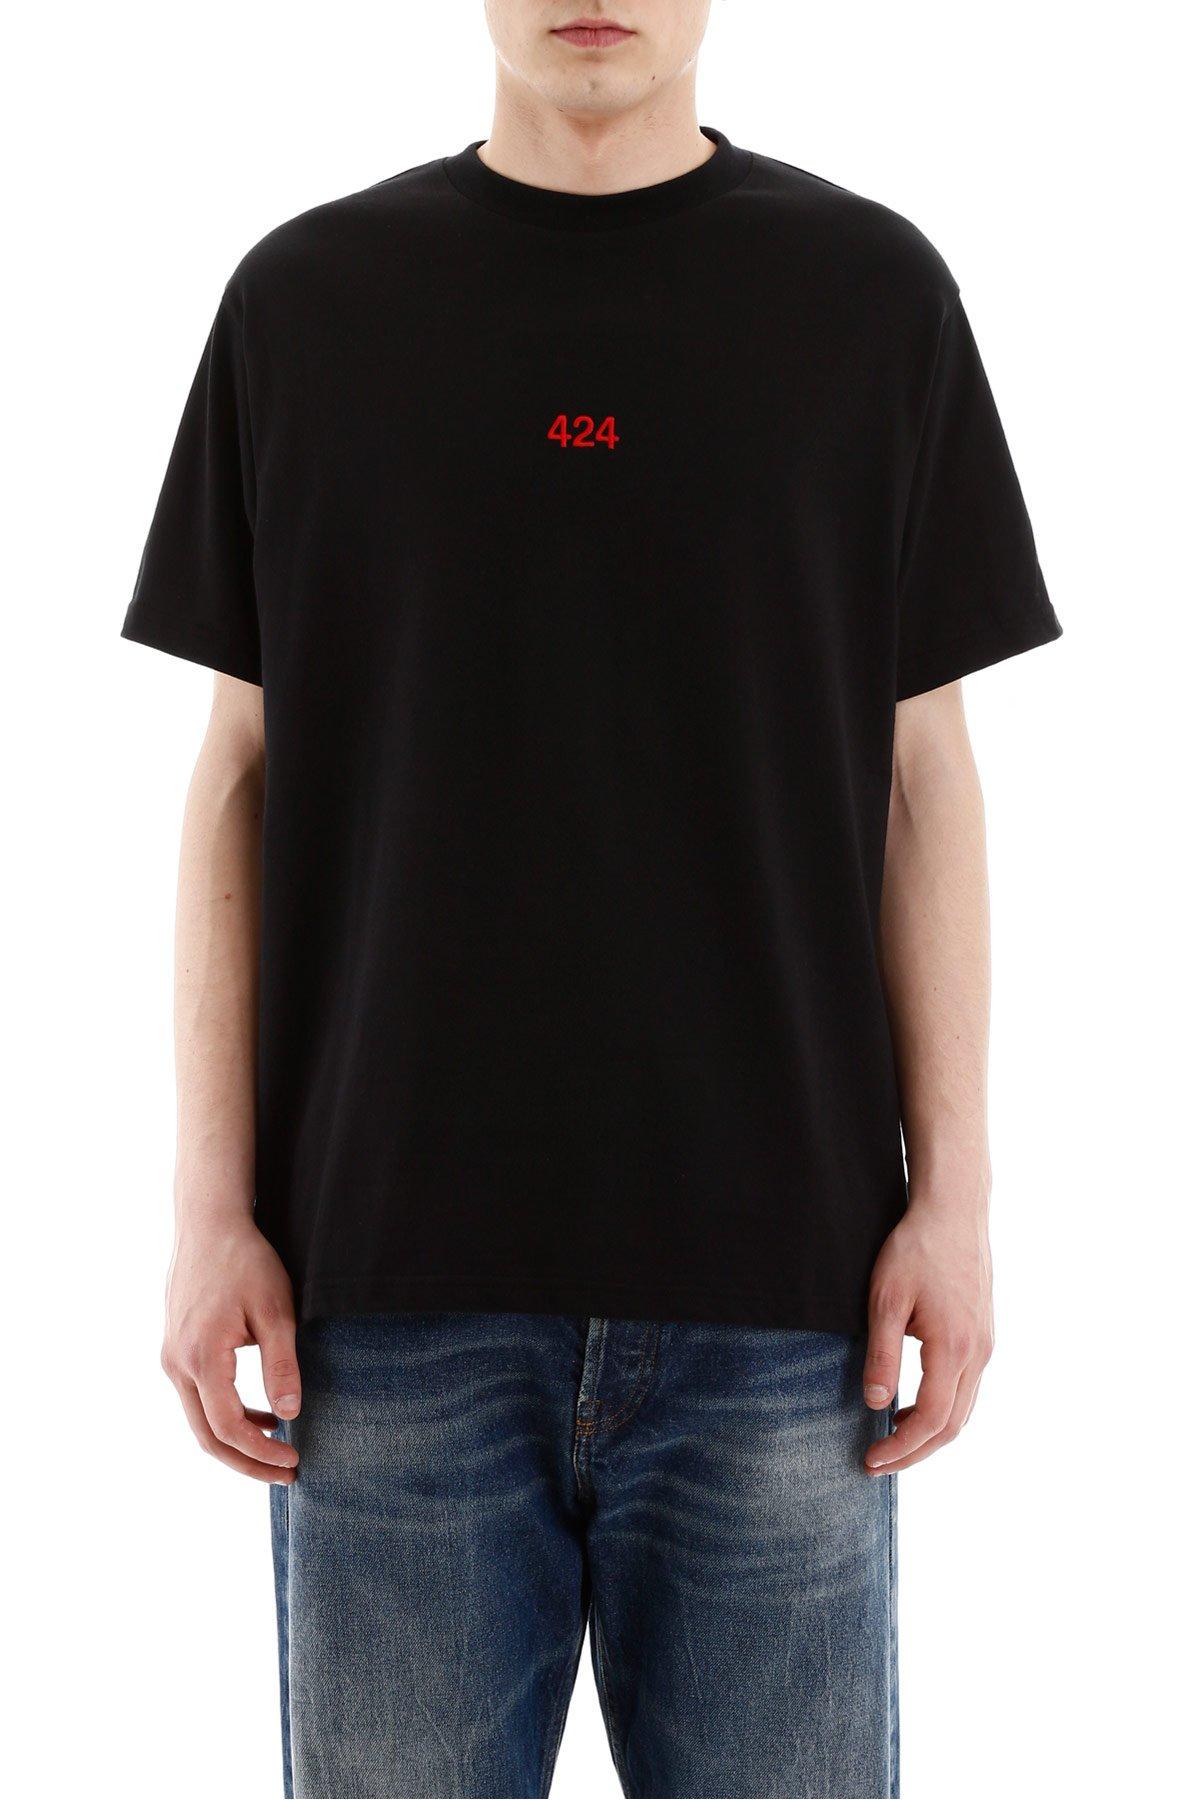 424 t-shirt logo